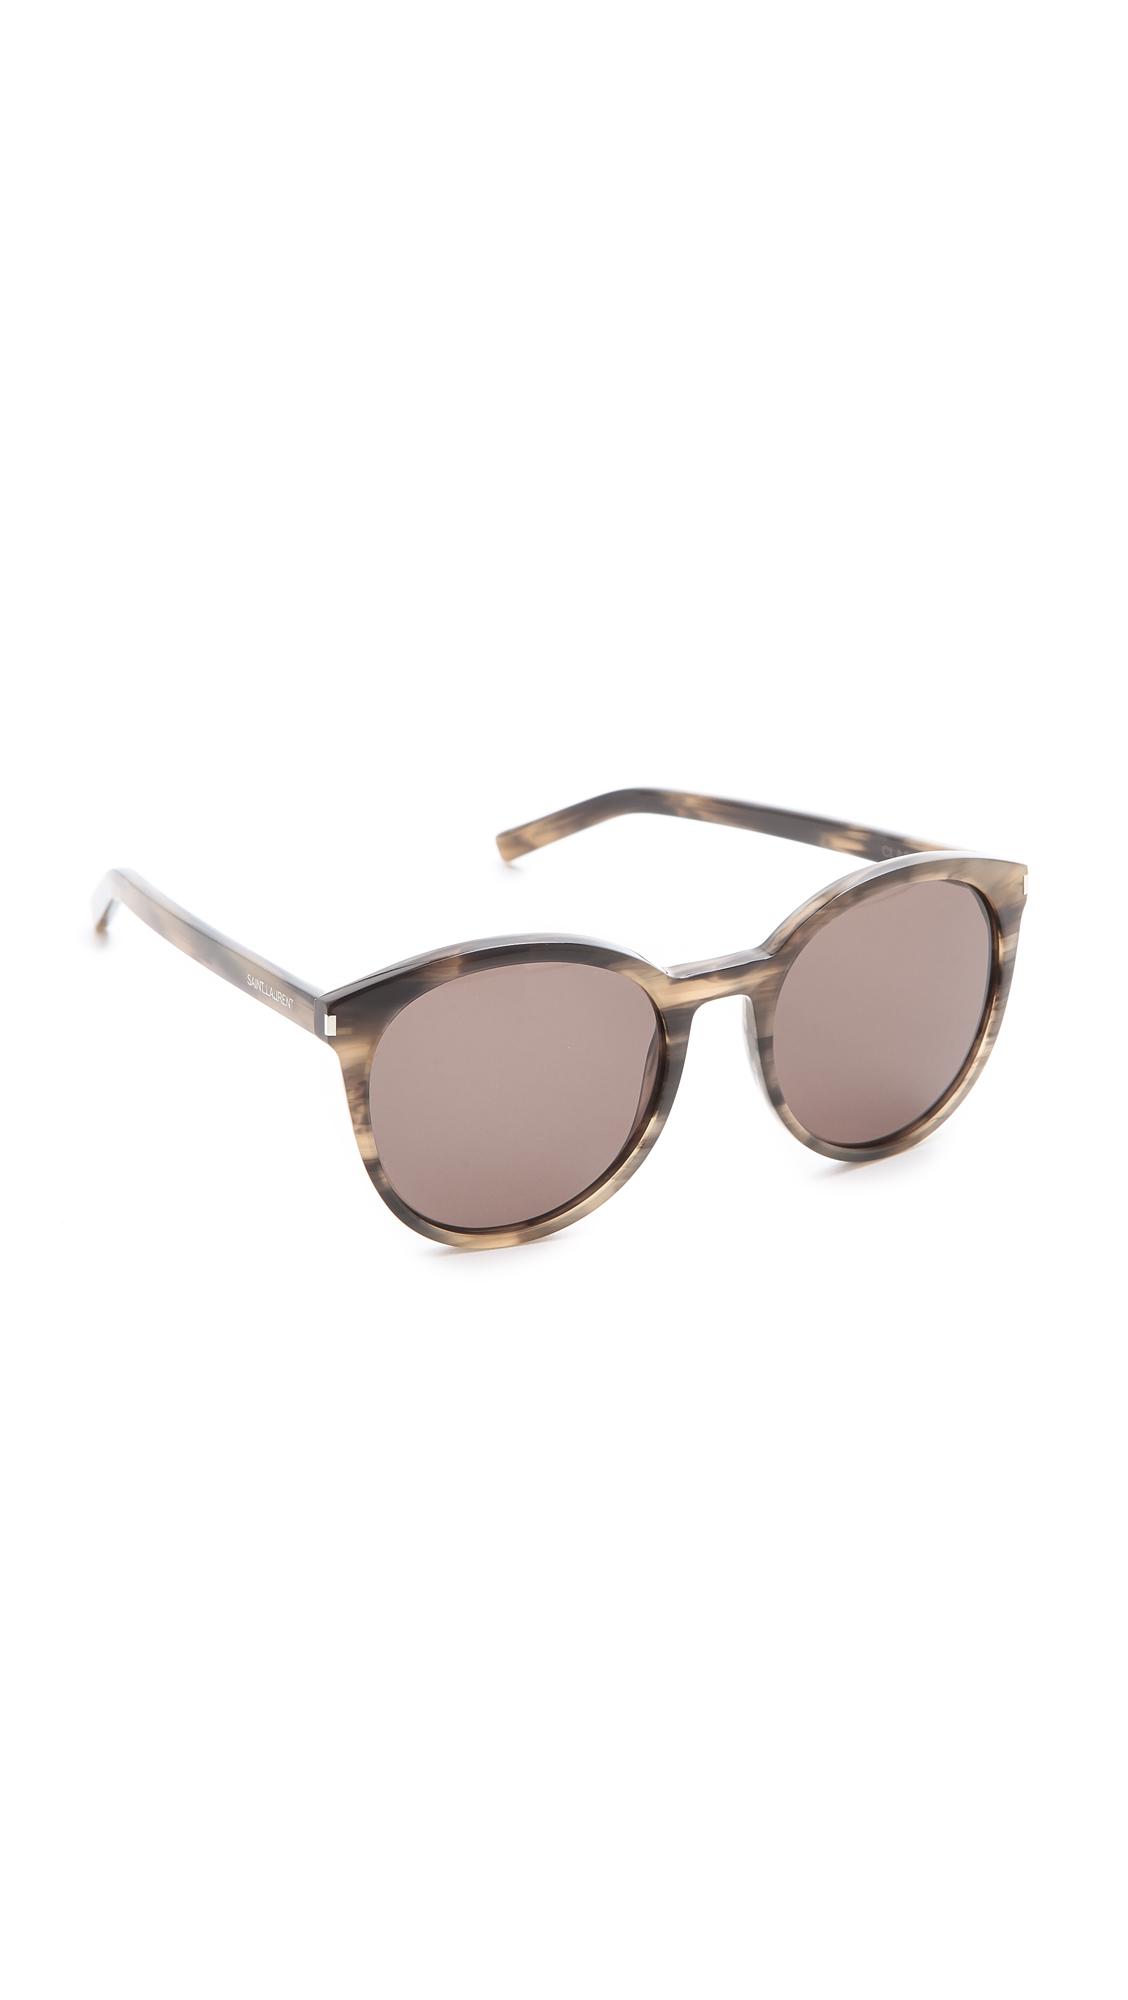 7f90e328b84 Saint Laurent Classic Preppy Round Sunglasses